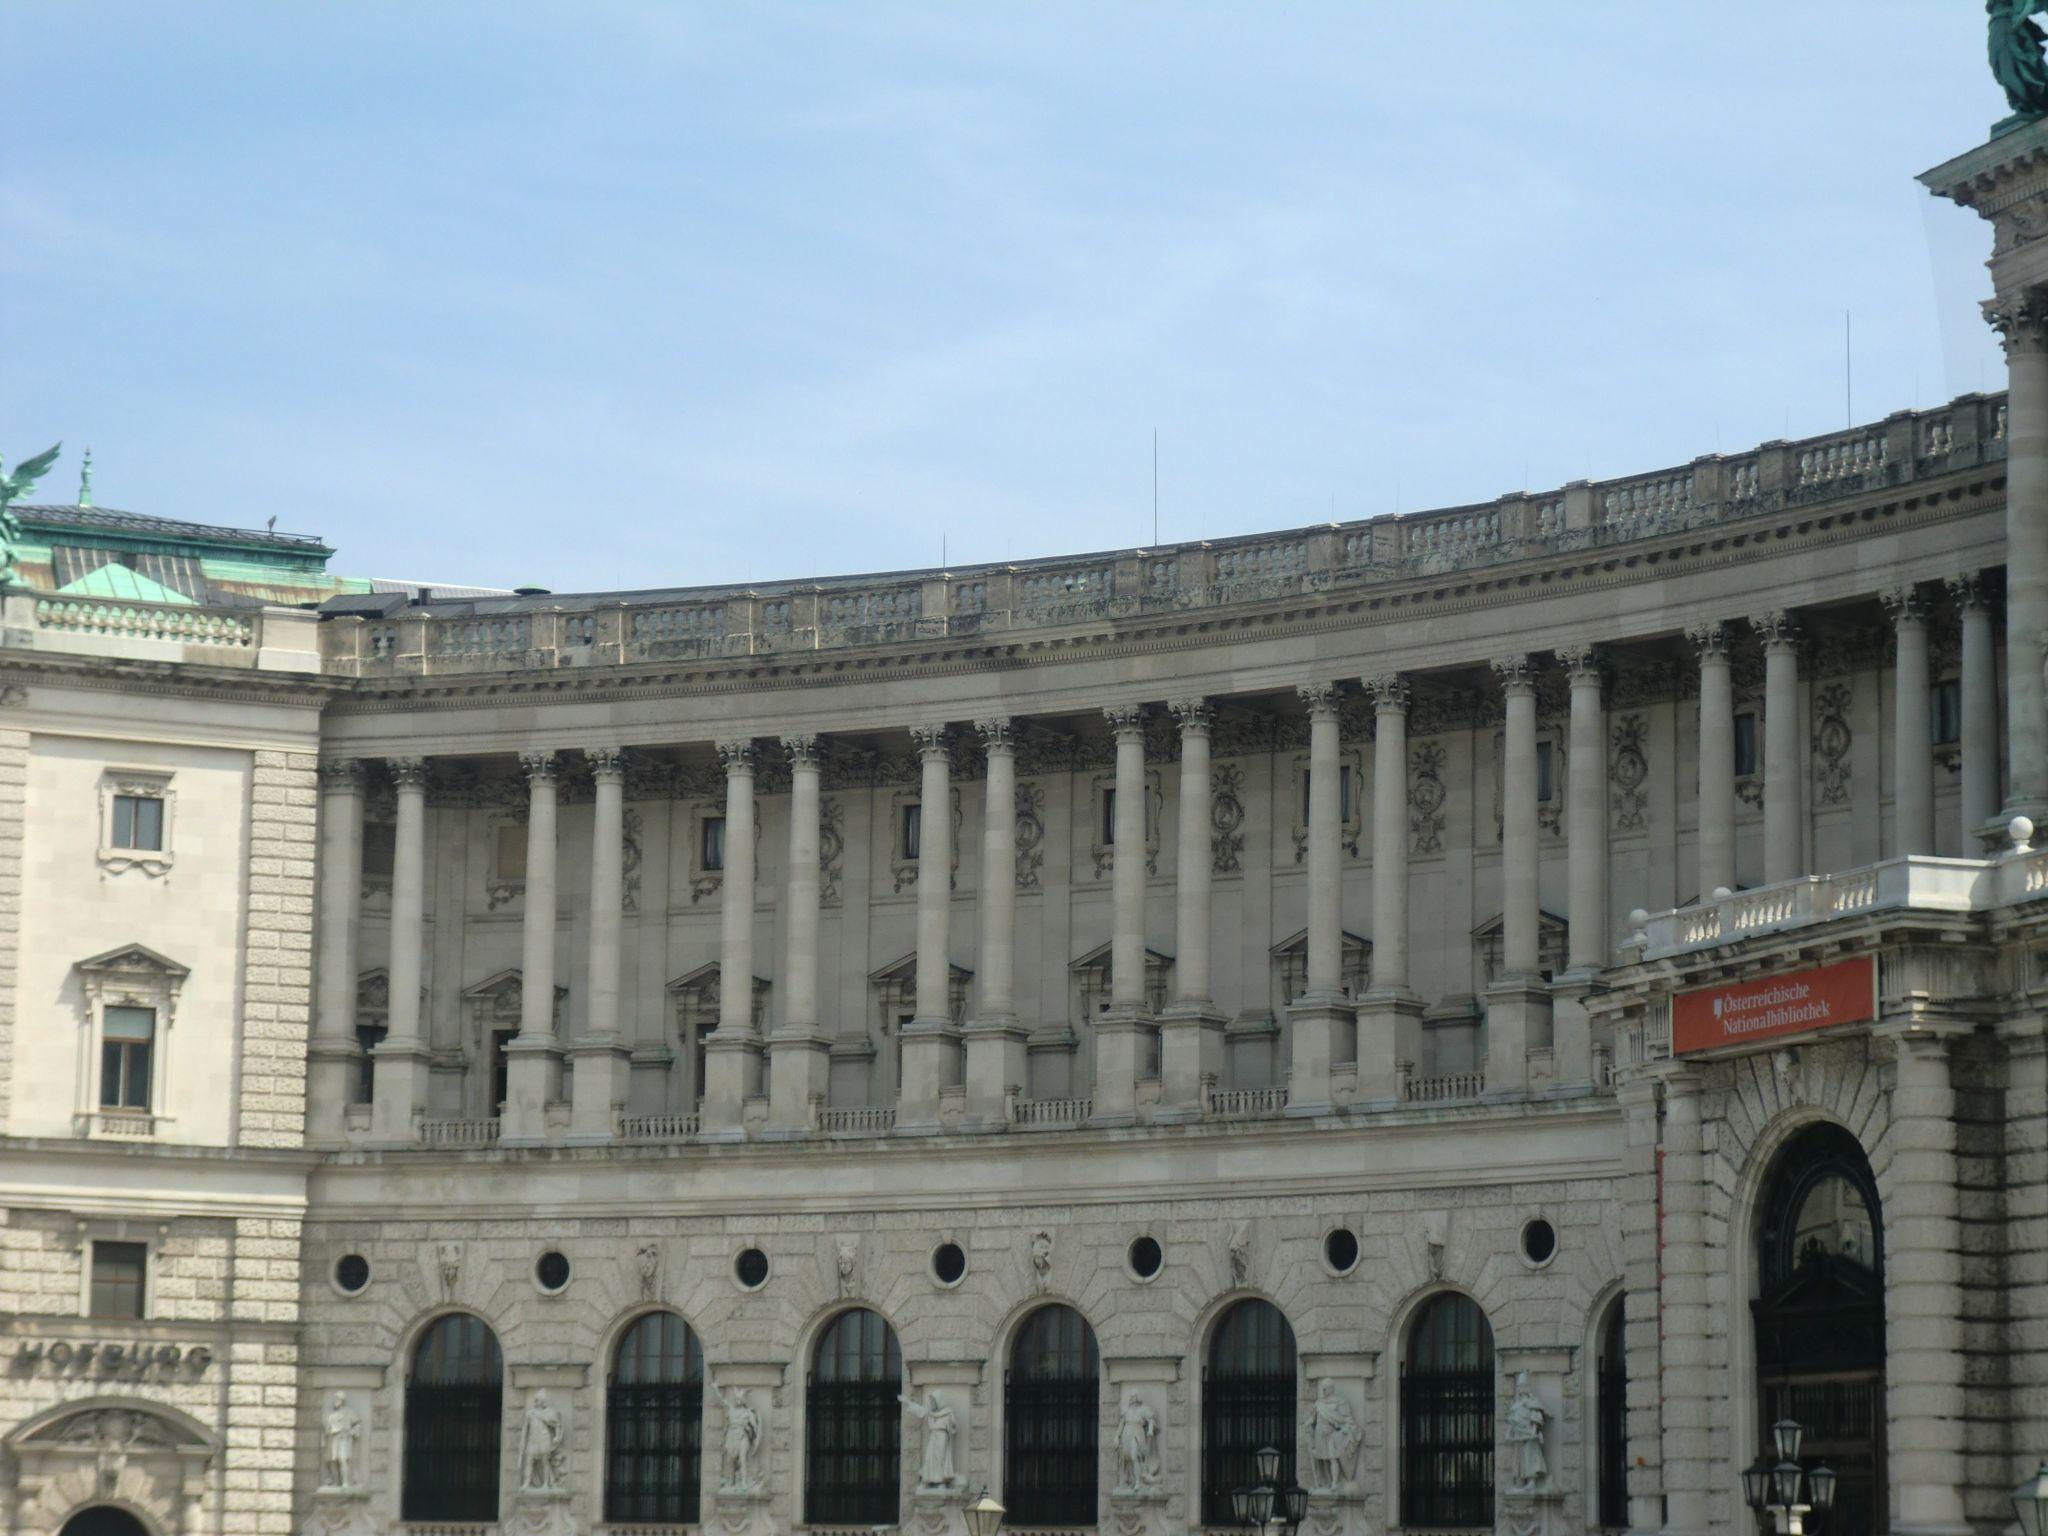 Vienna Hofburg 17 1440x1080 - Vienna: elegant beauty